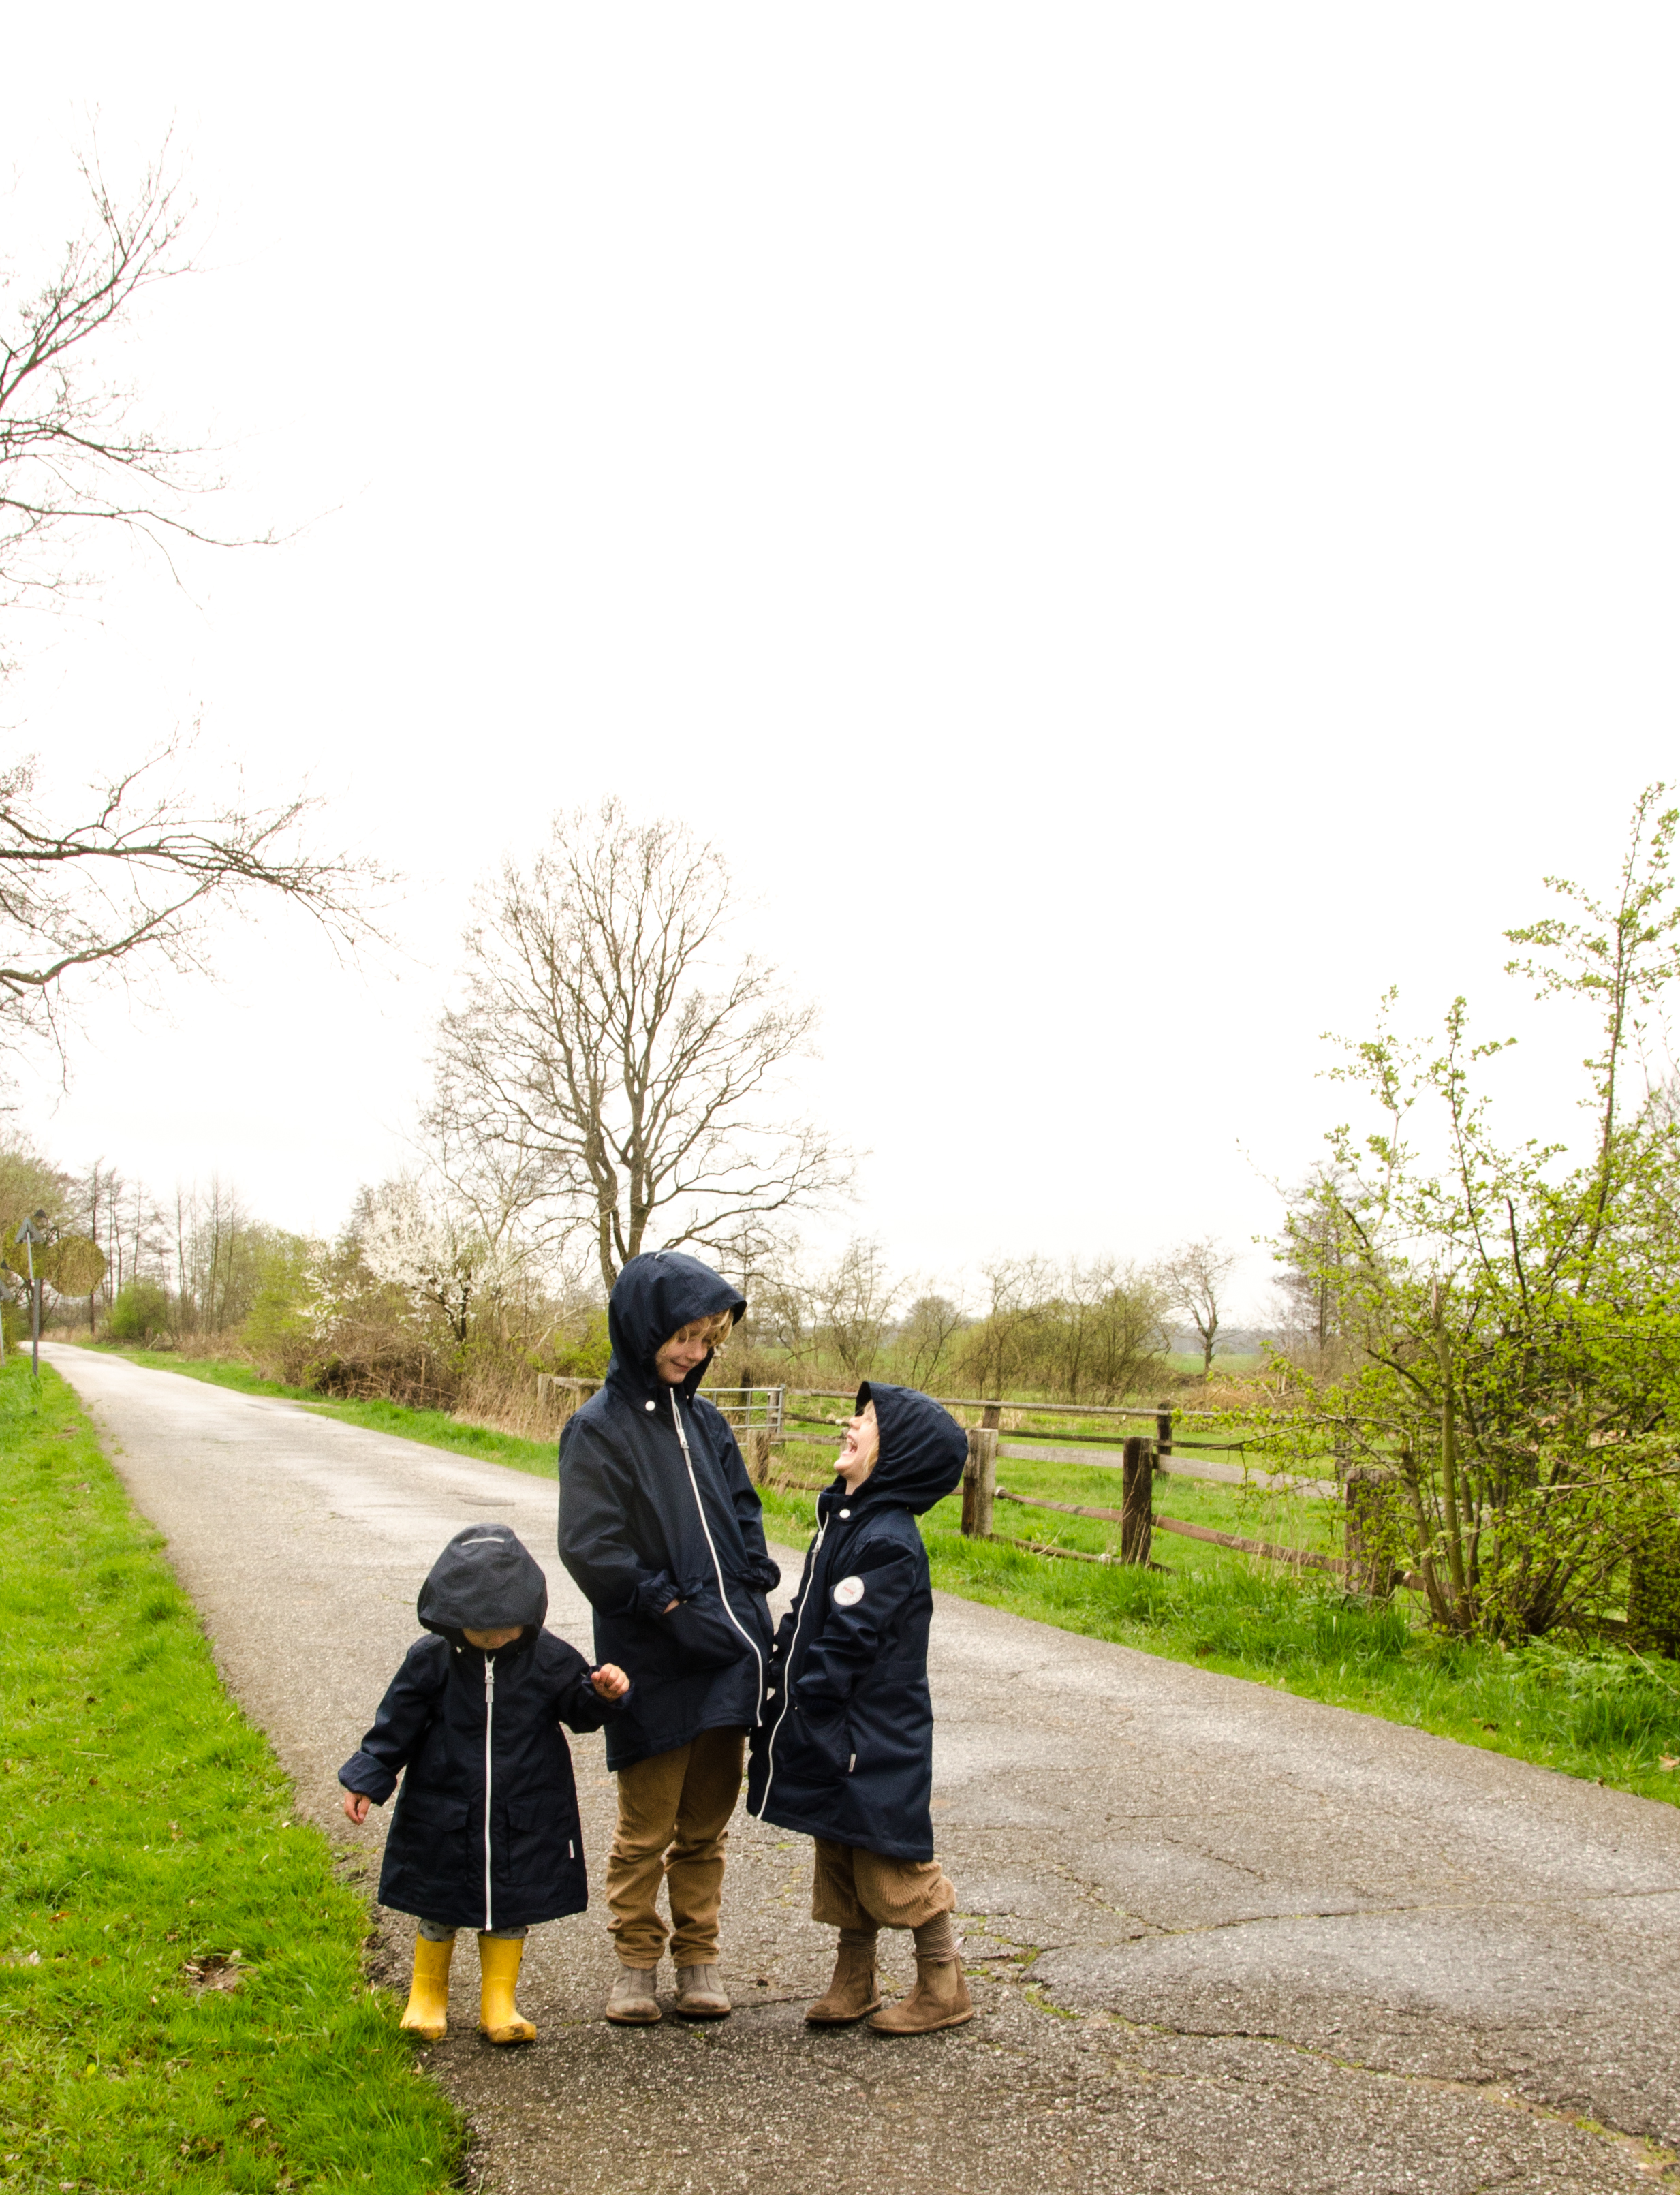 Regenjacken für KInder, Kinderregenjacke,